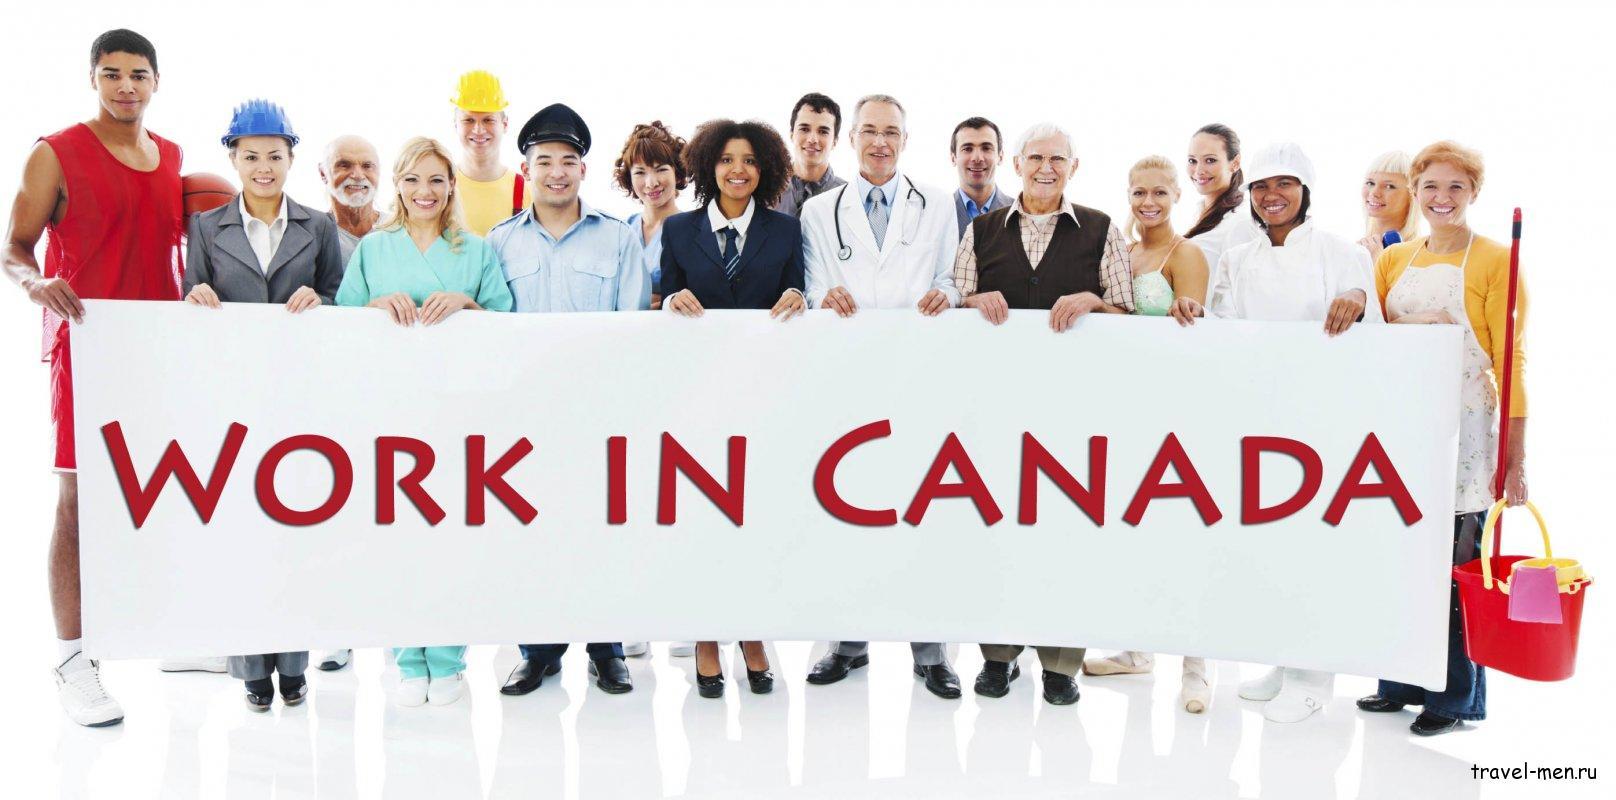 Как живут в Канаде